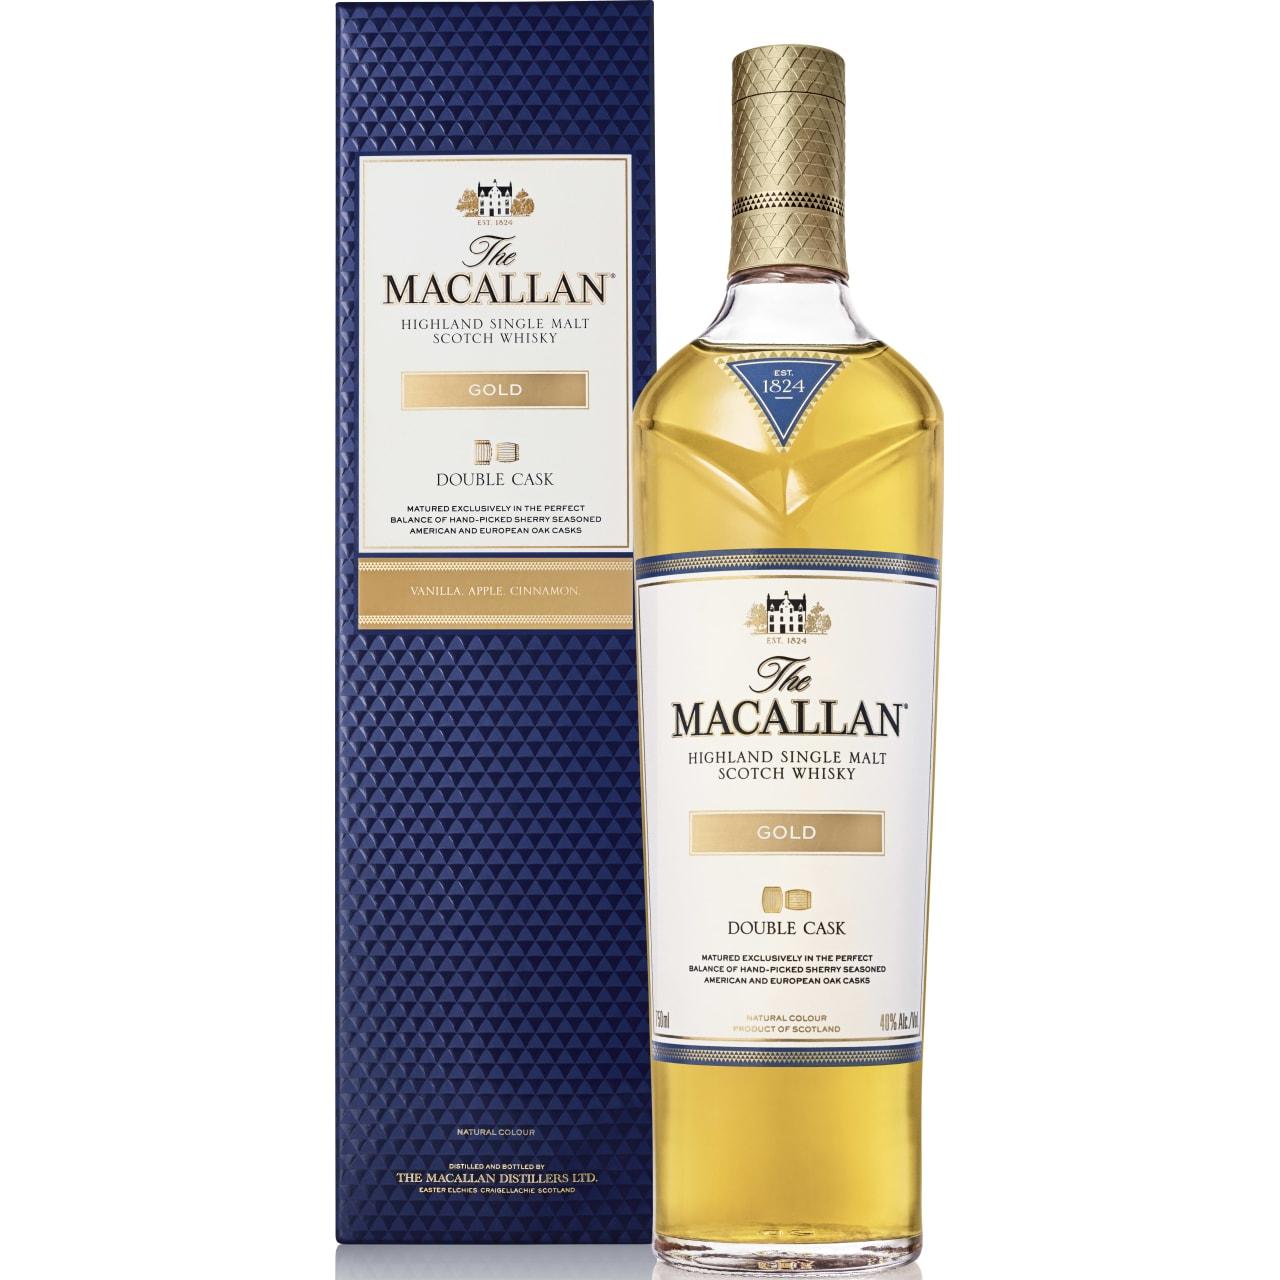 Product Image - The Macallan Gold Double Cask Single Malt